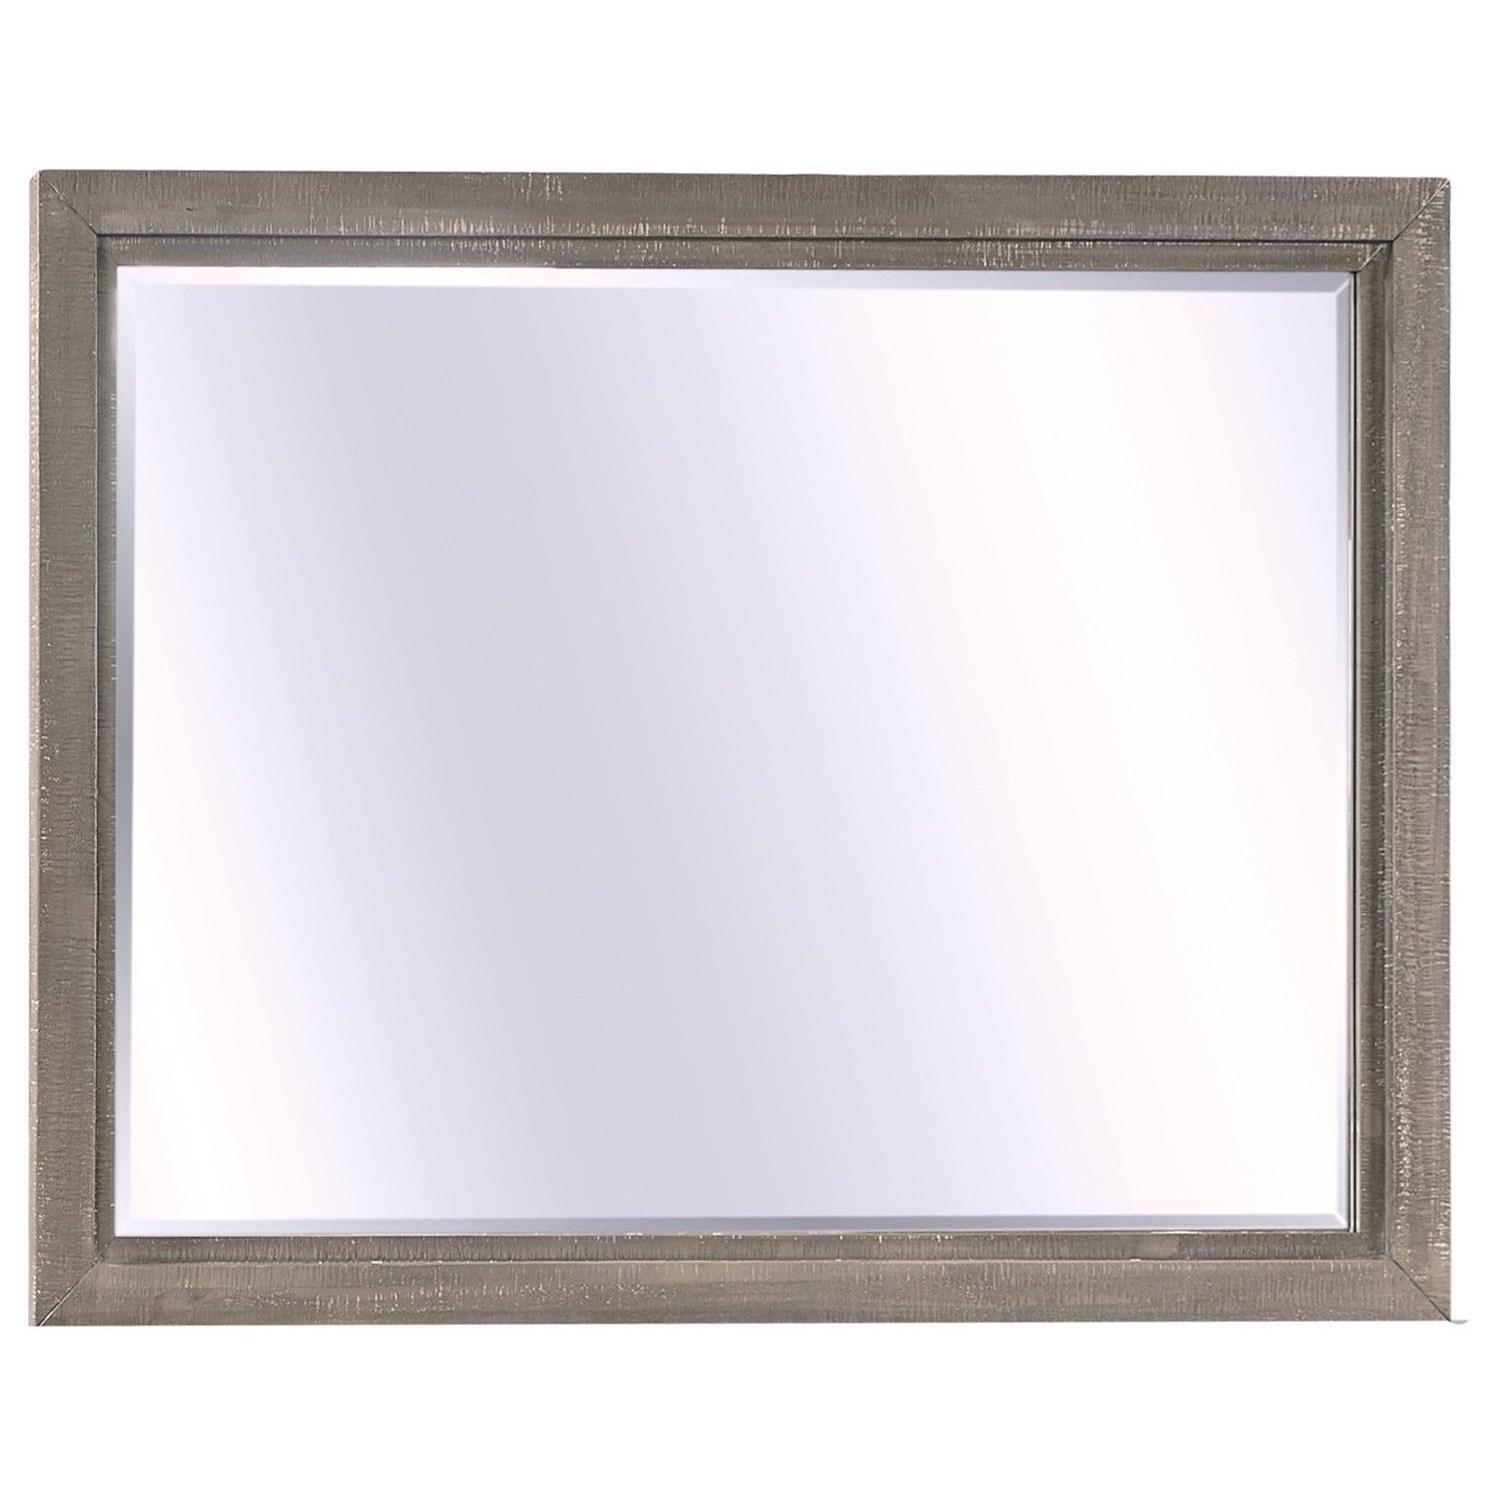 Radiata Landscape Dresser Mirror  by Aspenhome at Walker's Furniture